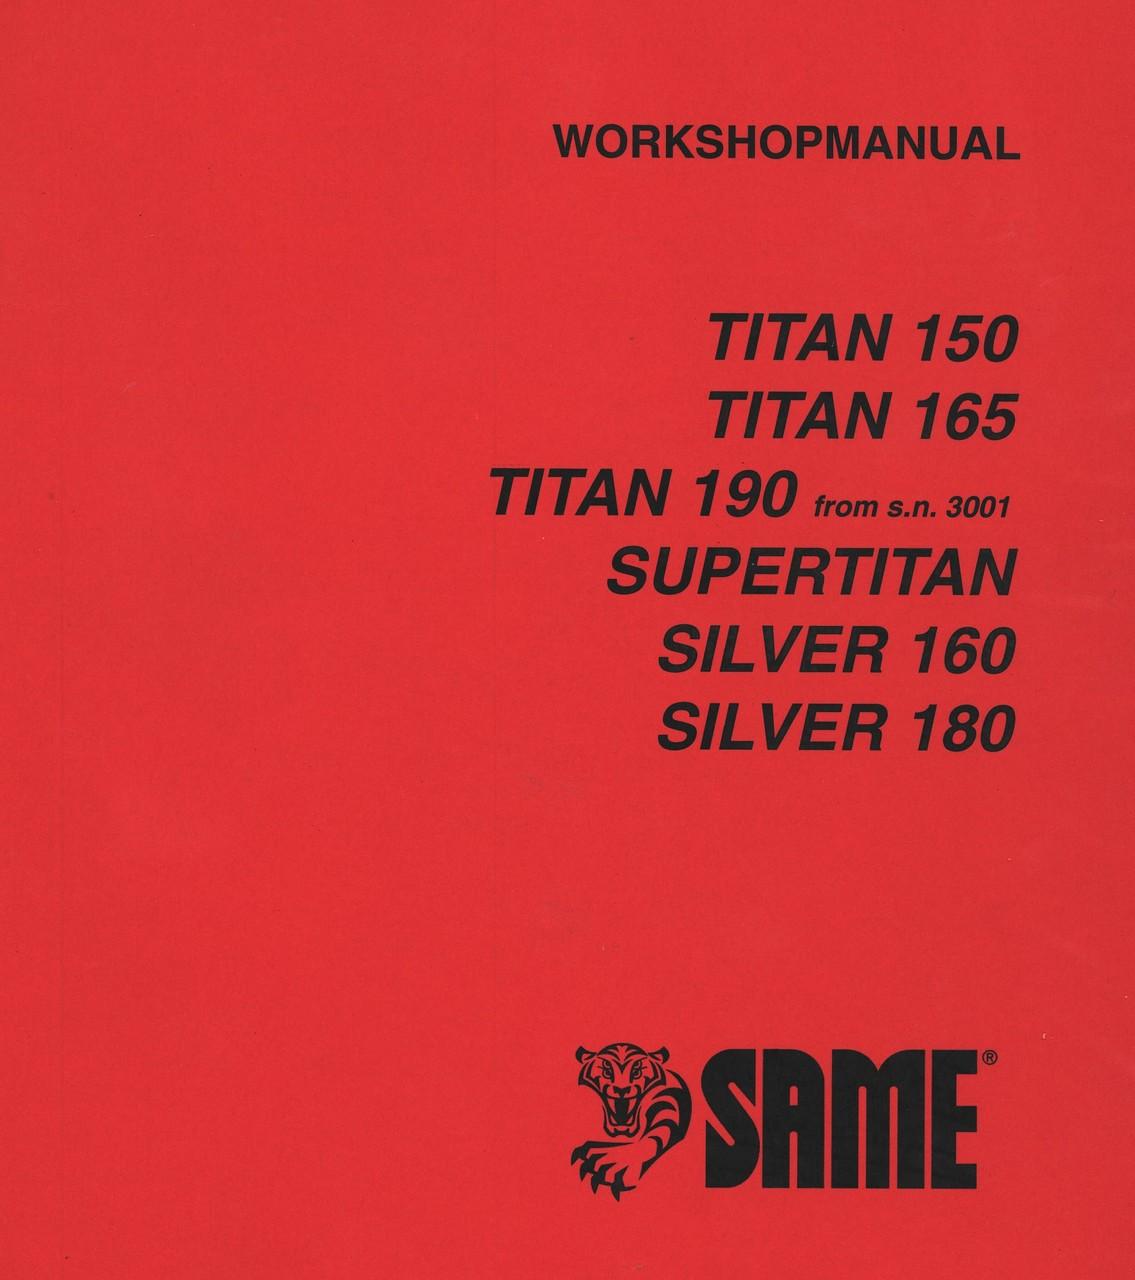 TITAN 150 - TITAN 165 - TITAN 190 from s.n.3001 - SUPERTITAN - SILVER 160 - SILVER 180 - Workshop manual